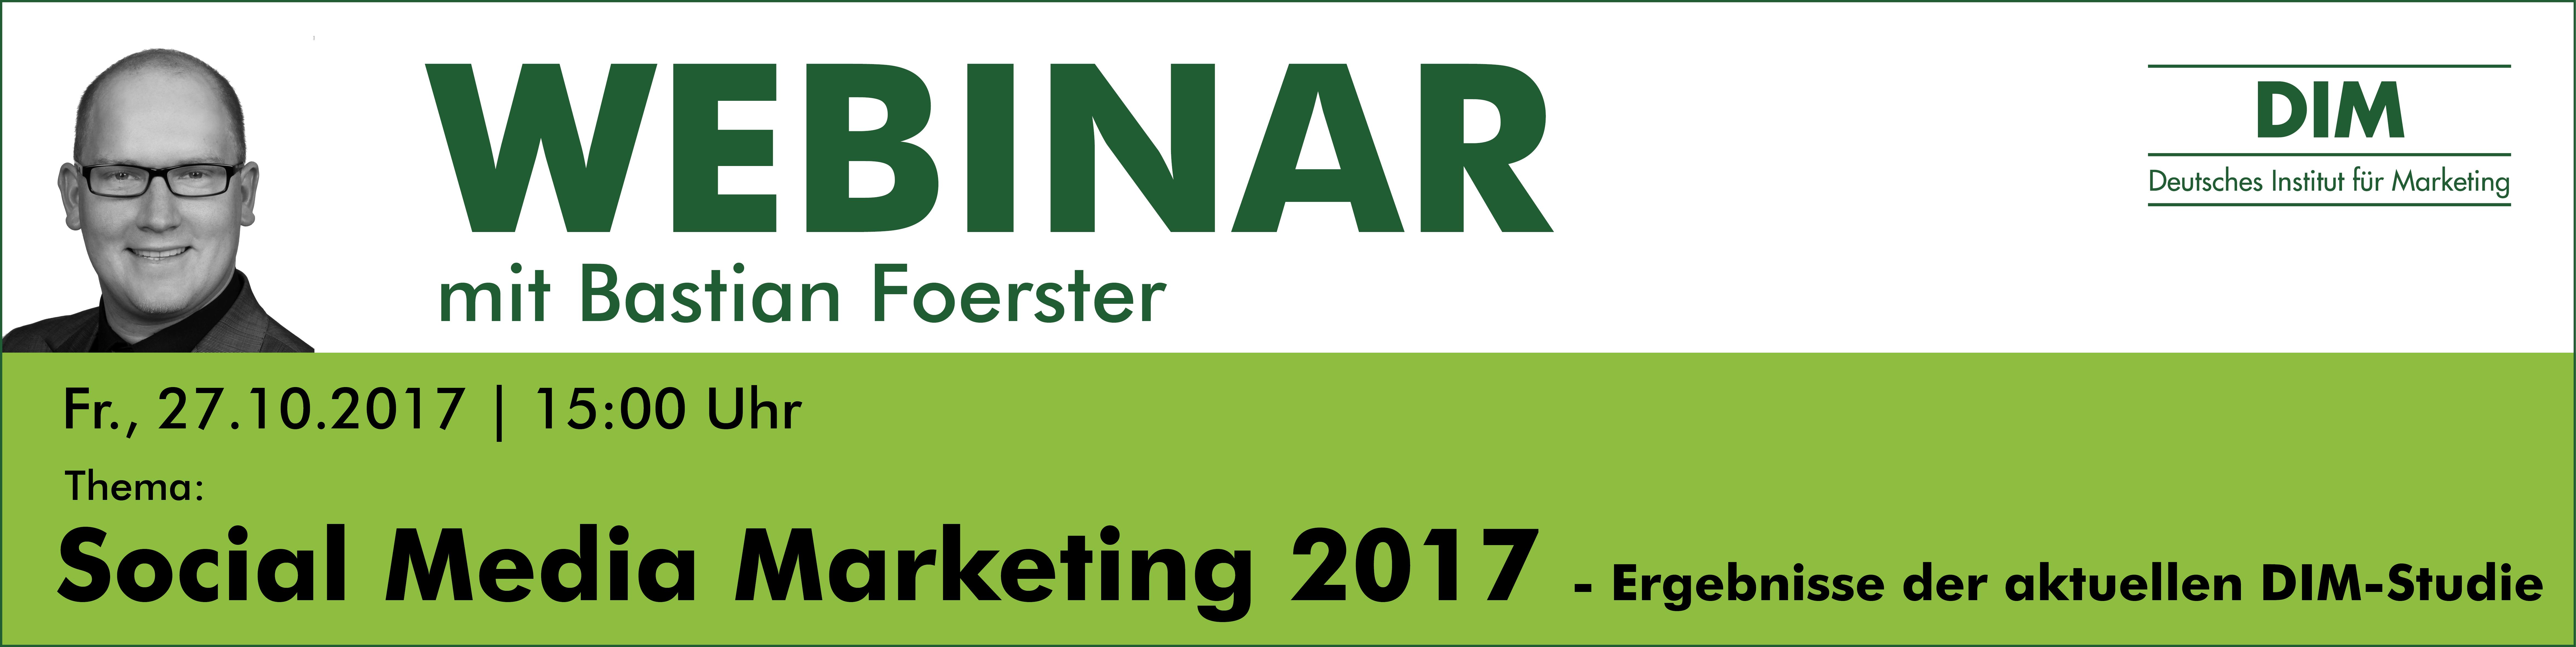 Webinar Social Media Marketing Studie 2017